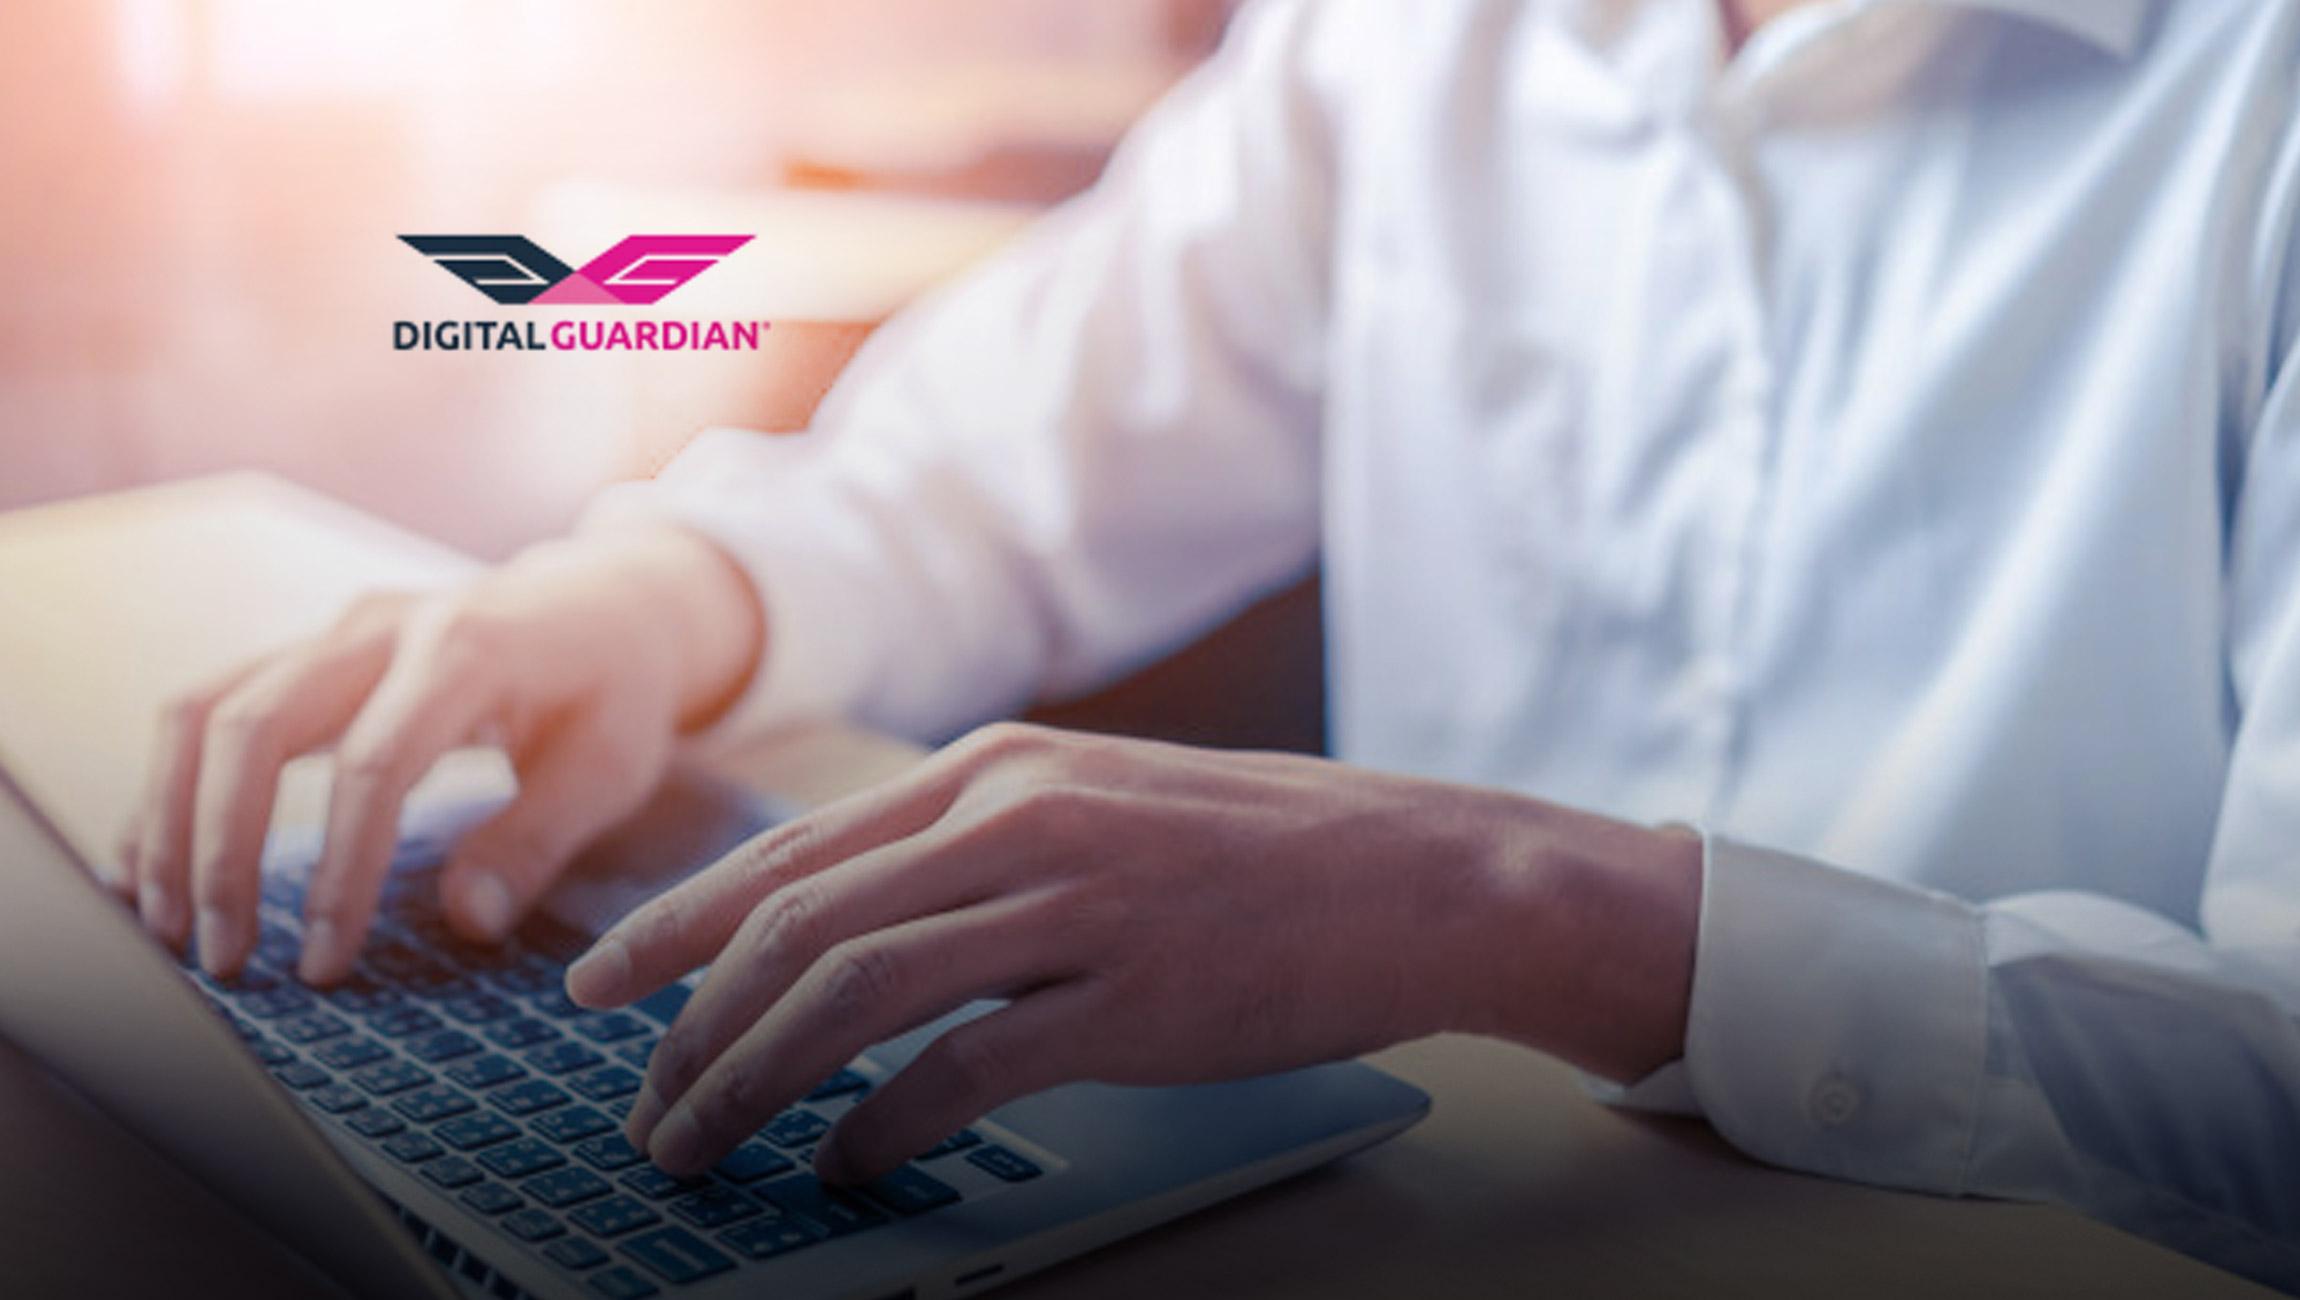 Digital Guardian Delivers Enterprise Data Loss Prevention for Microsoft Teams